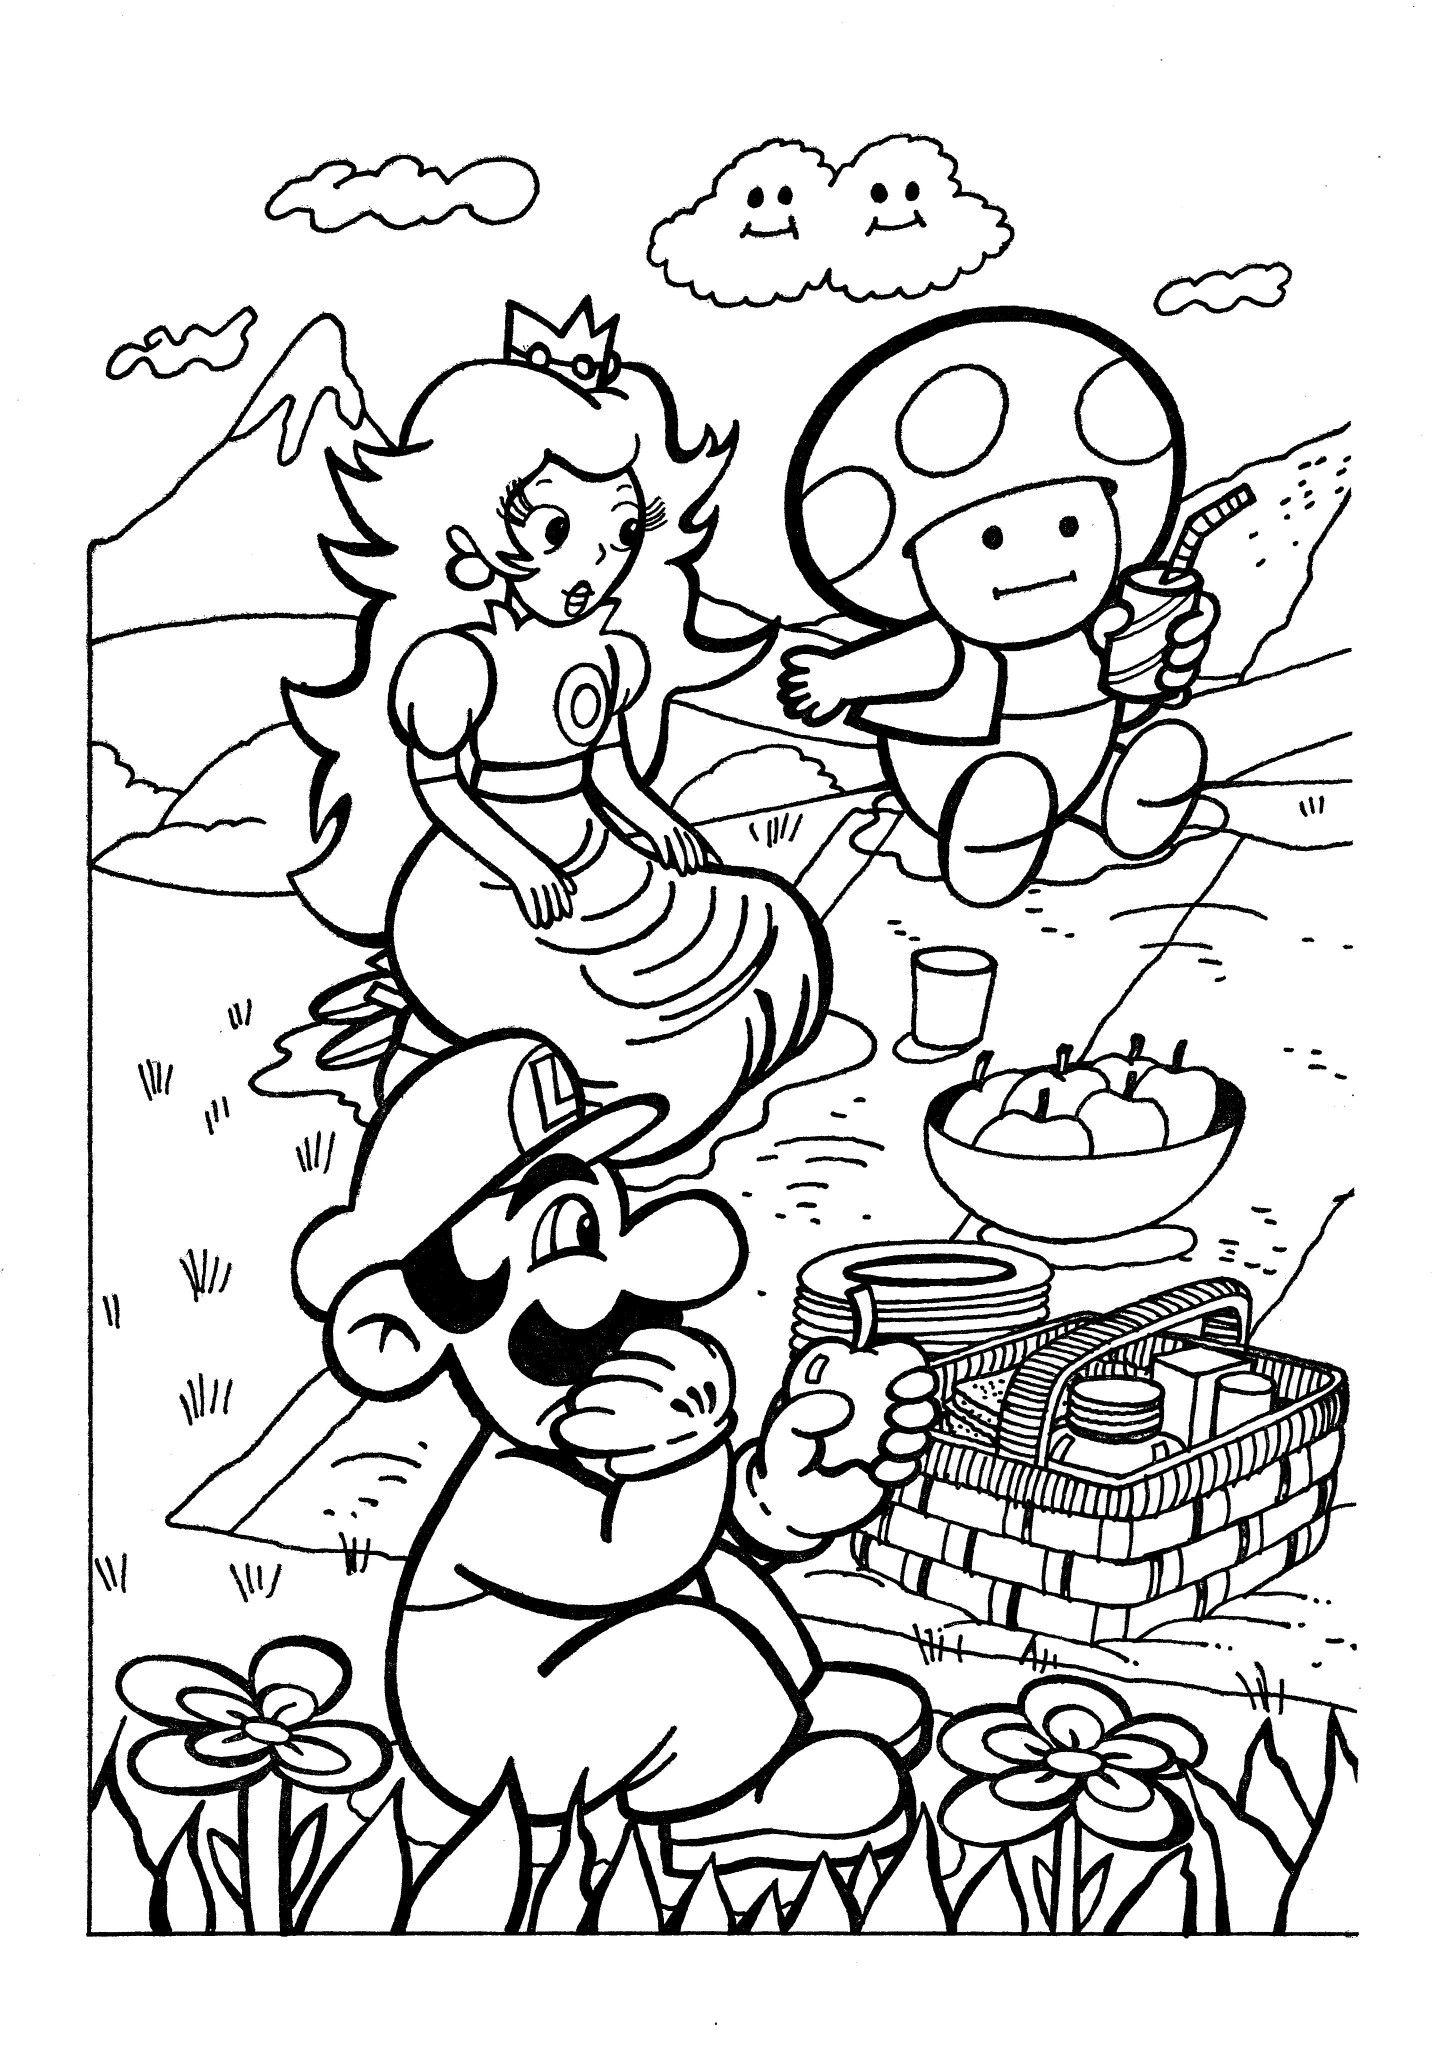 Super Mario Bros 2 Coloring Book Pg1 Posted Vgart Tidbits Coloring Books Mario Bros Super Mario Bros